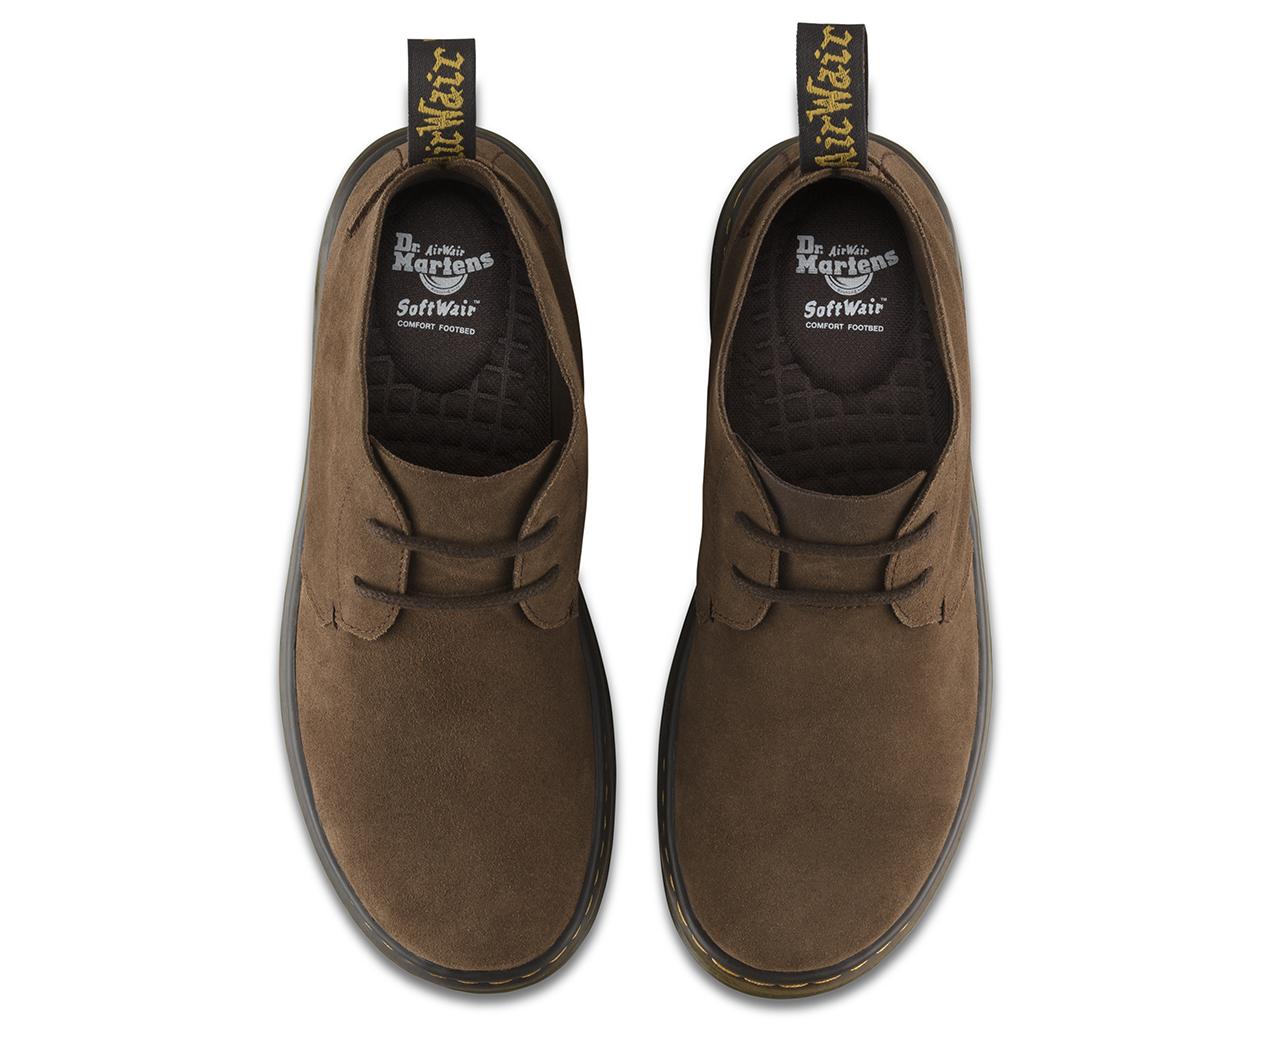 89c63c4f0c0 EMBER SUEDE | Men's Boots | Official Dr Martens Store - UK